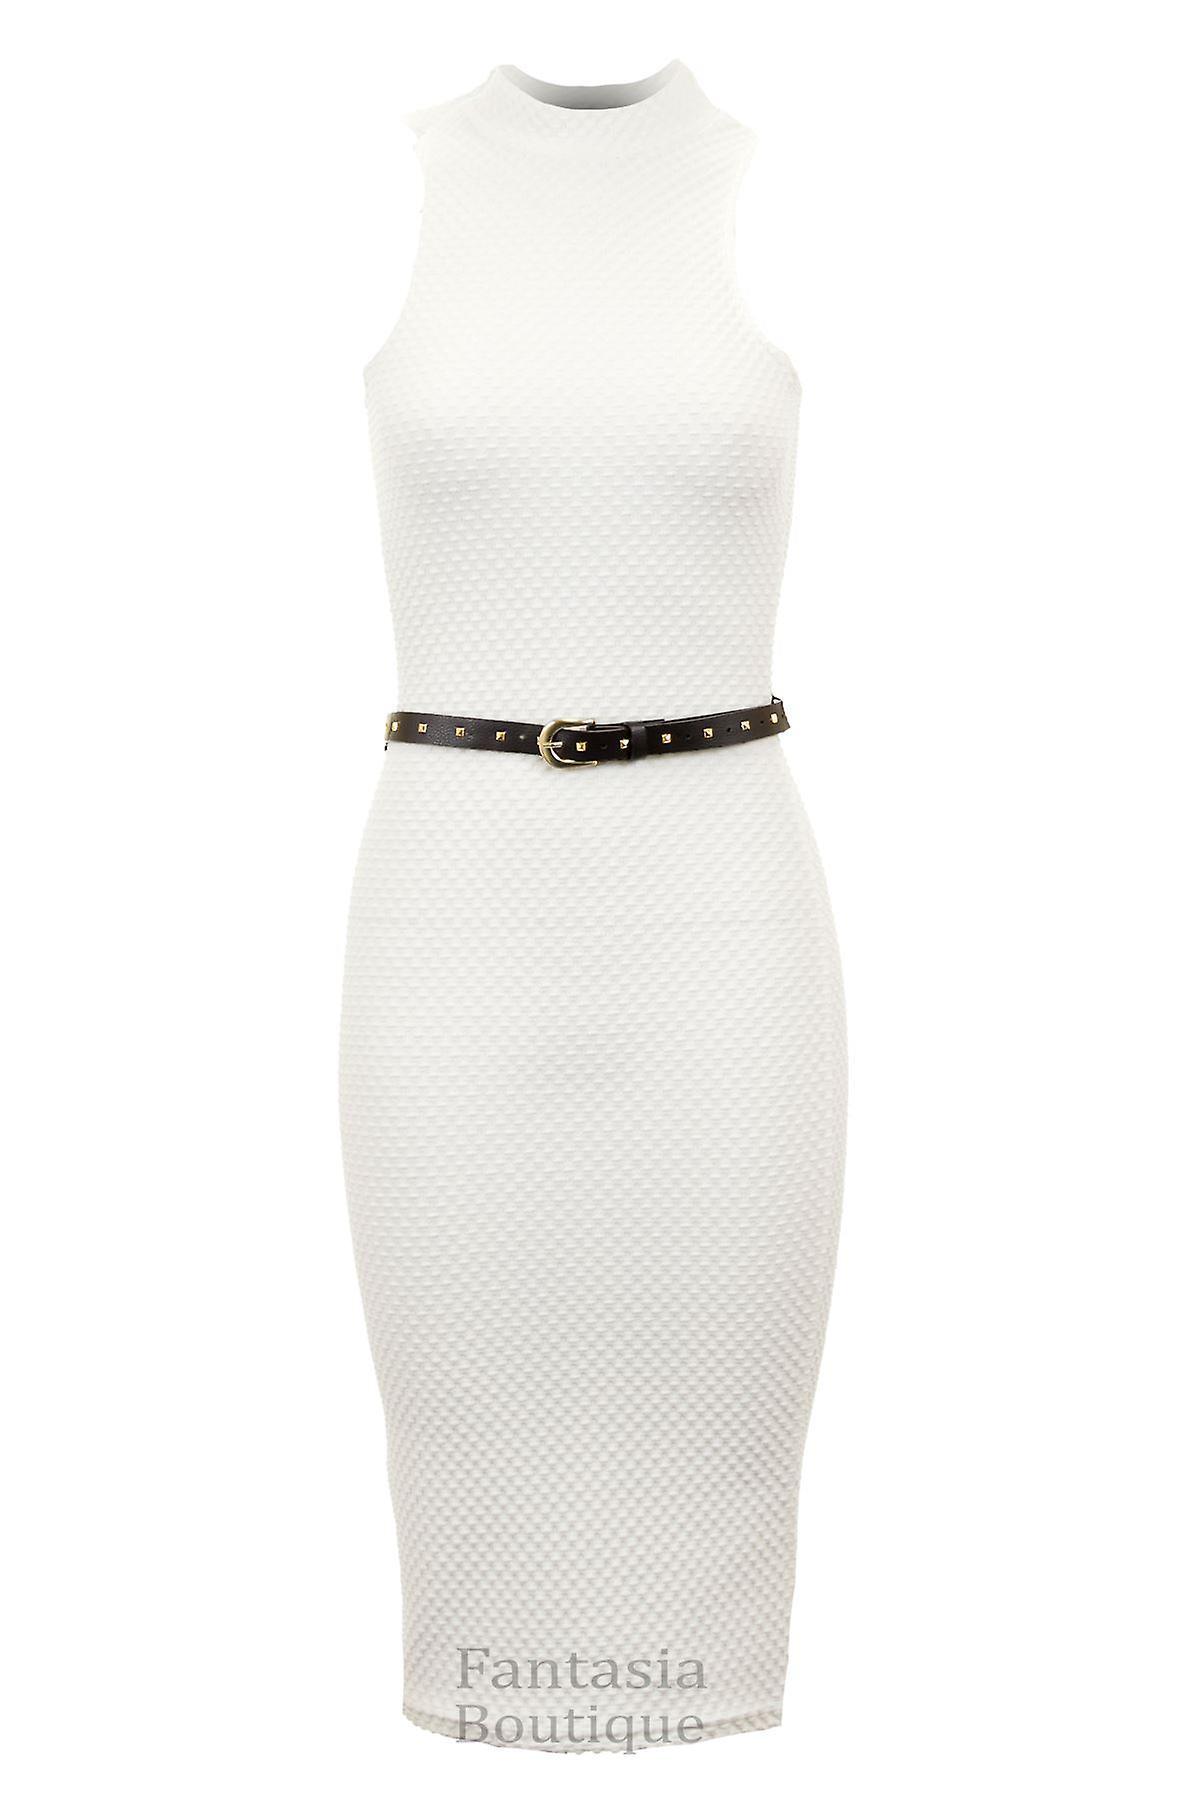 Ladies Sleevless Black Shiny Beaded Open Neck Short Bodycon Women's Dress